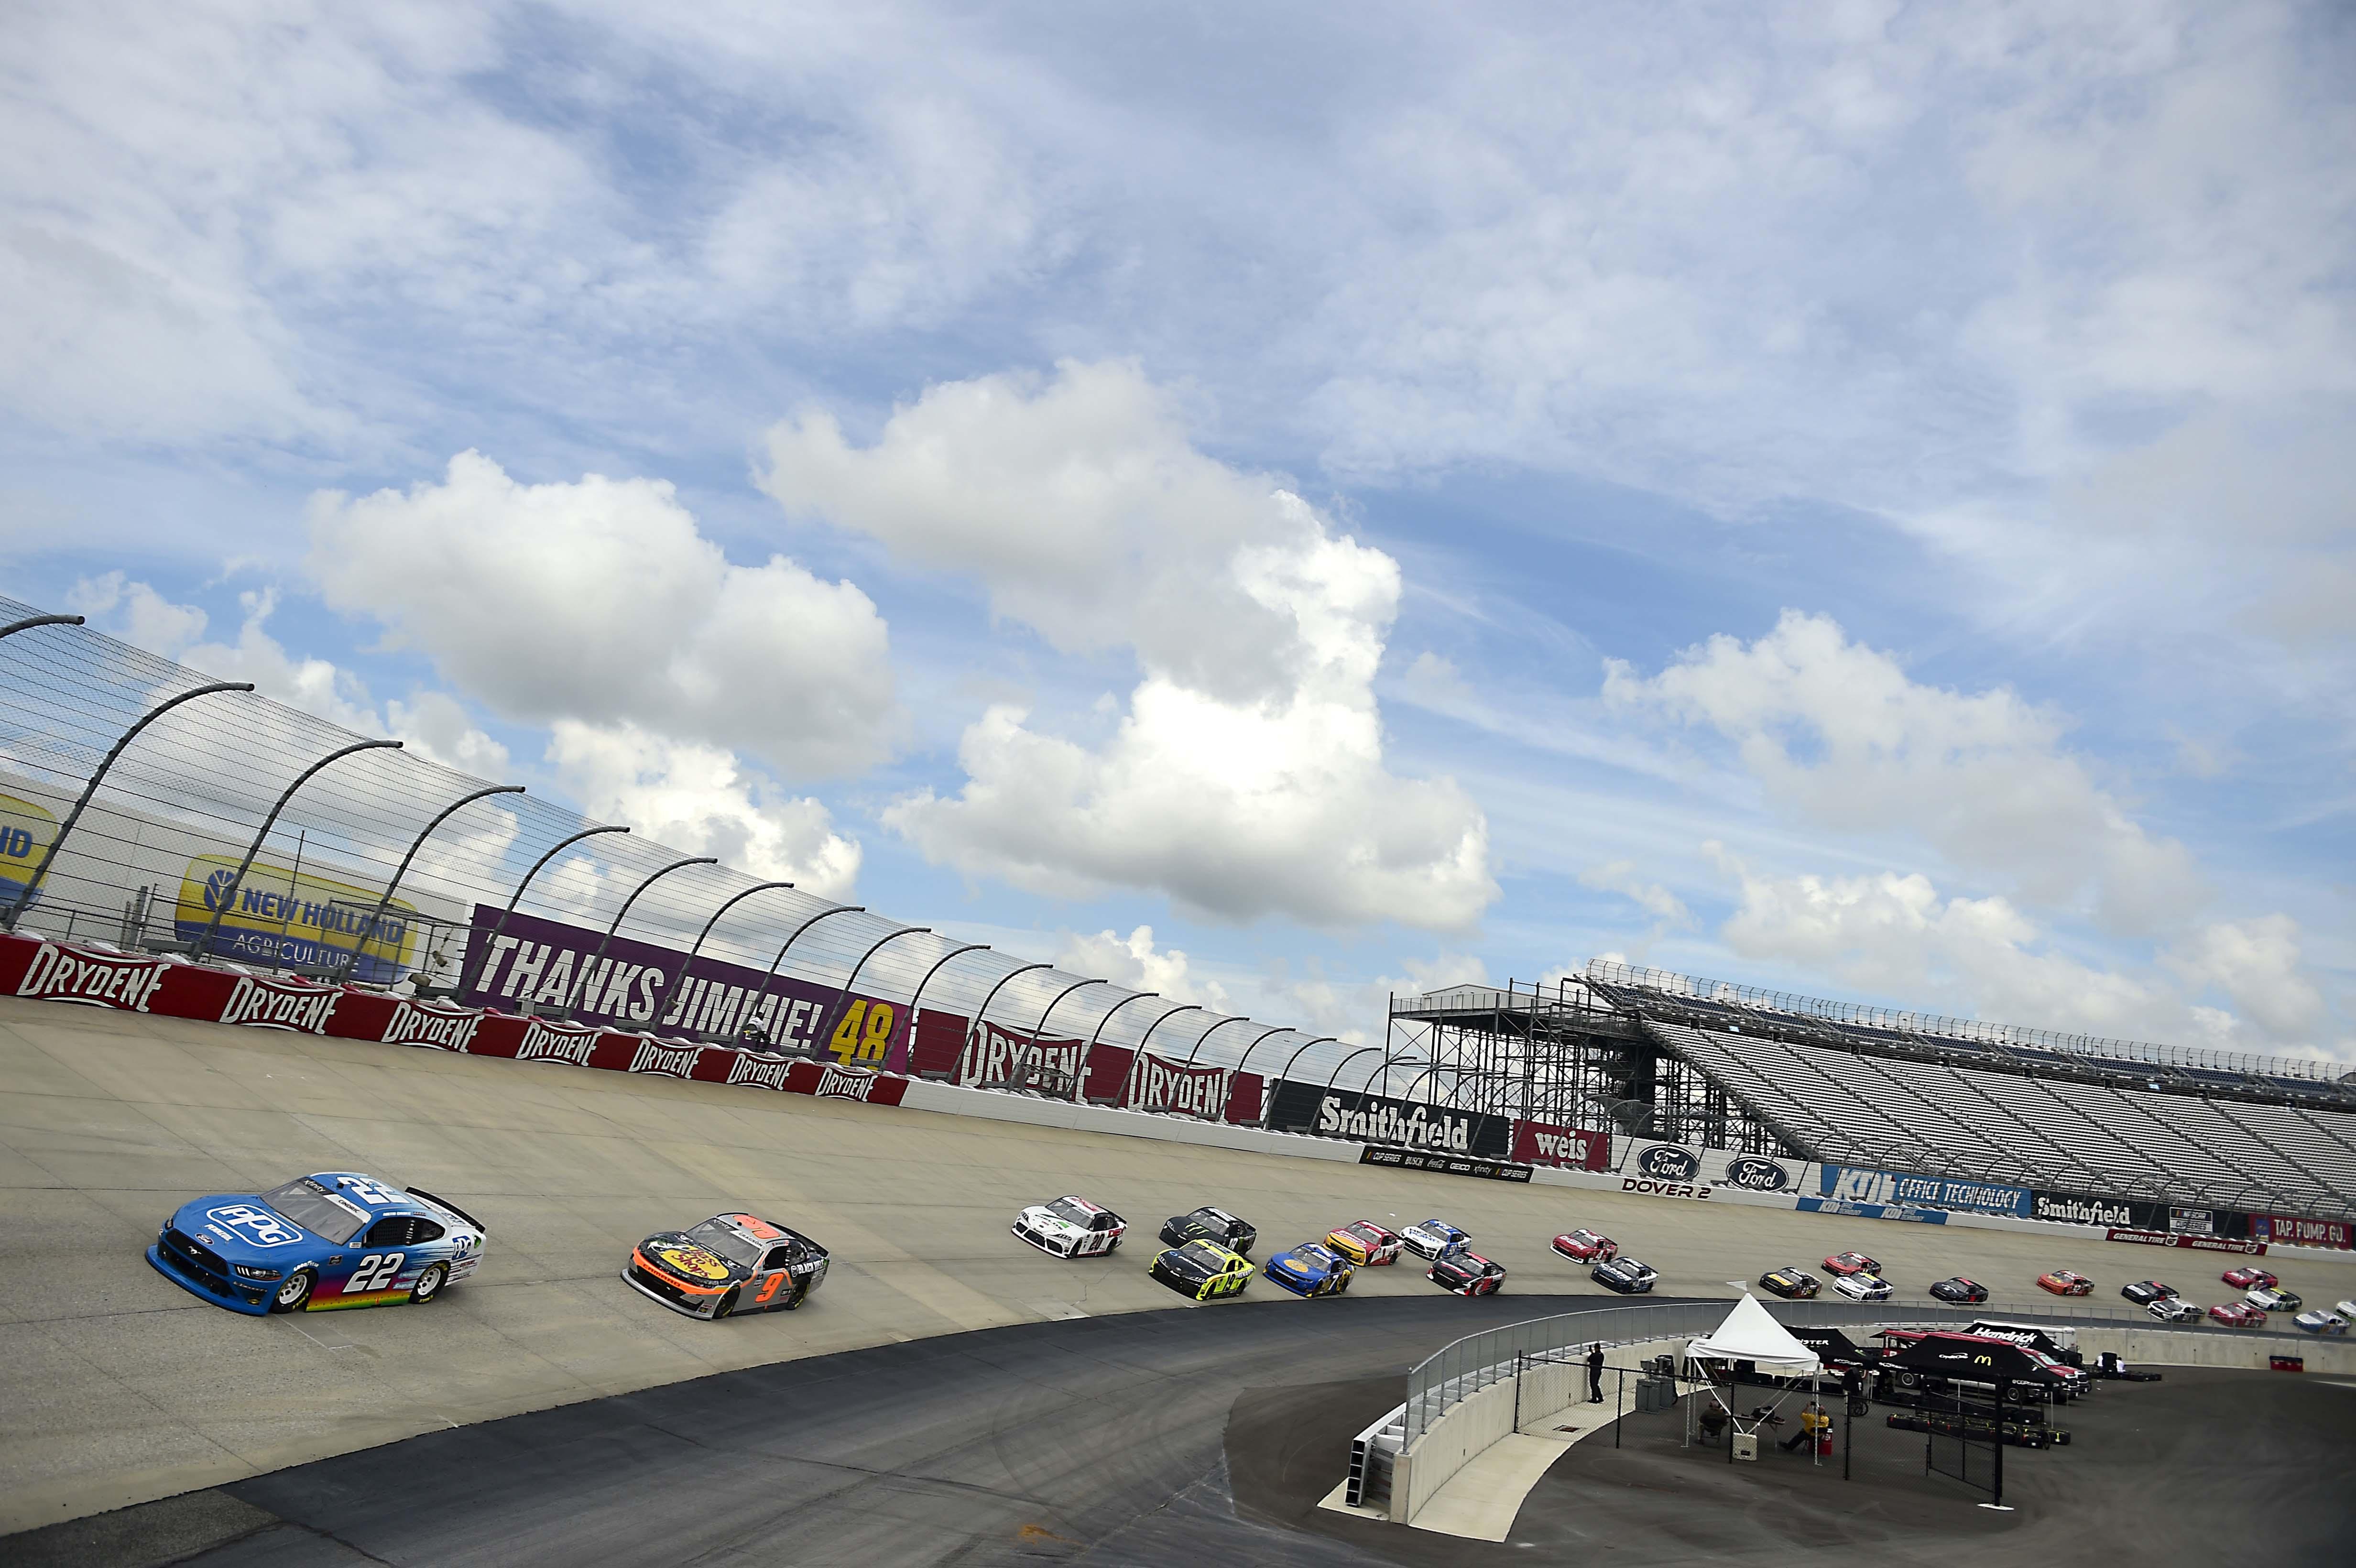 Austin Cindric and Noah Gragson - Dover International Speedway - NASCAR Xfinity Series